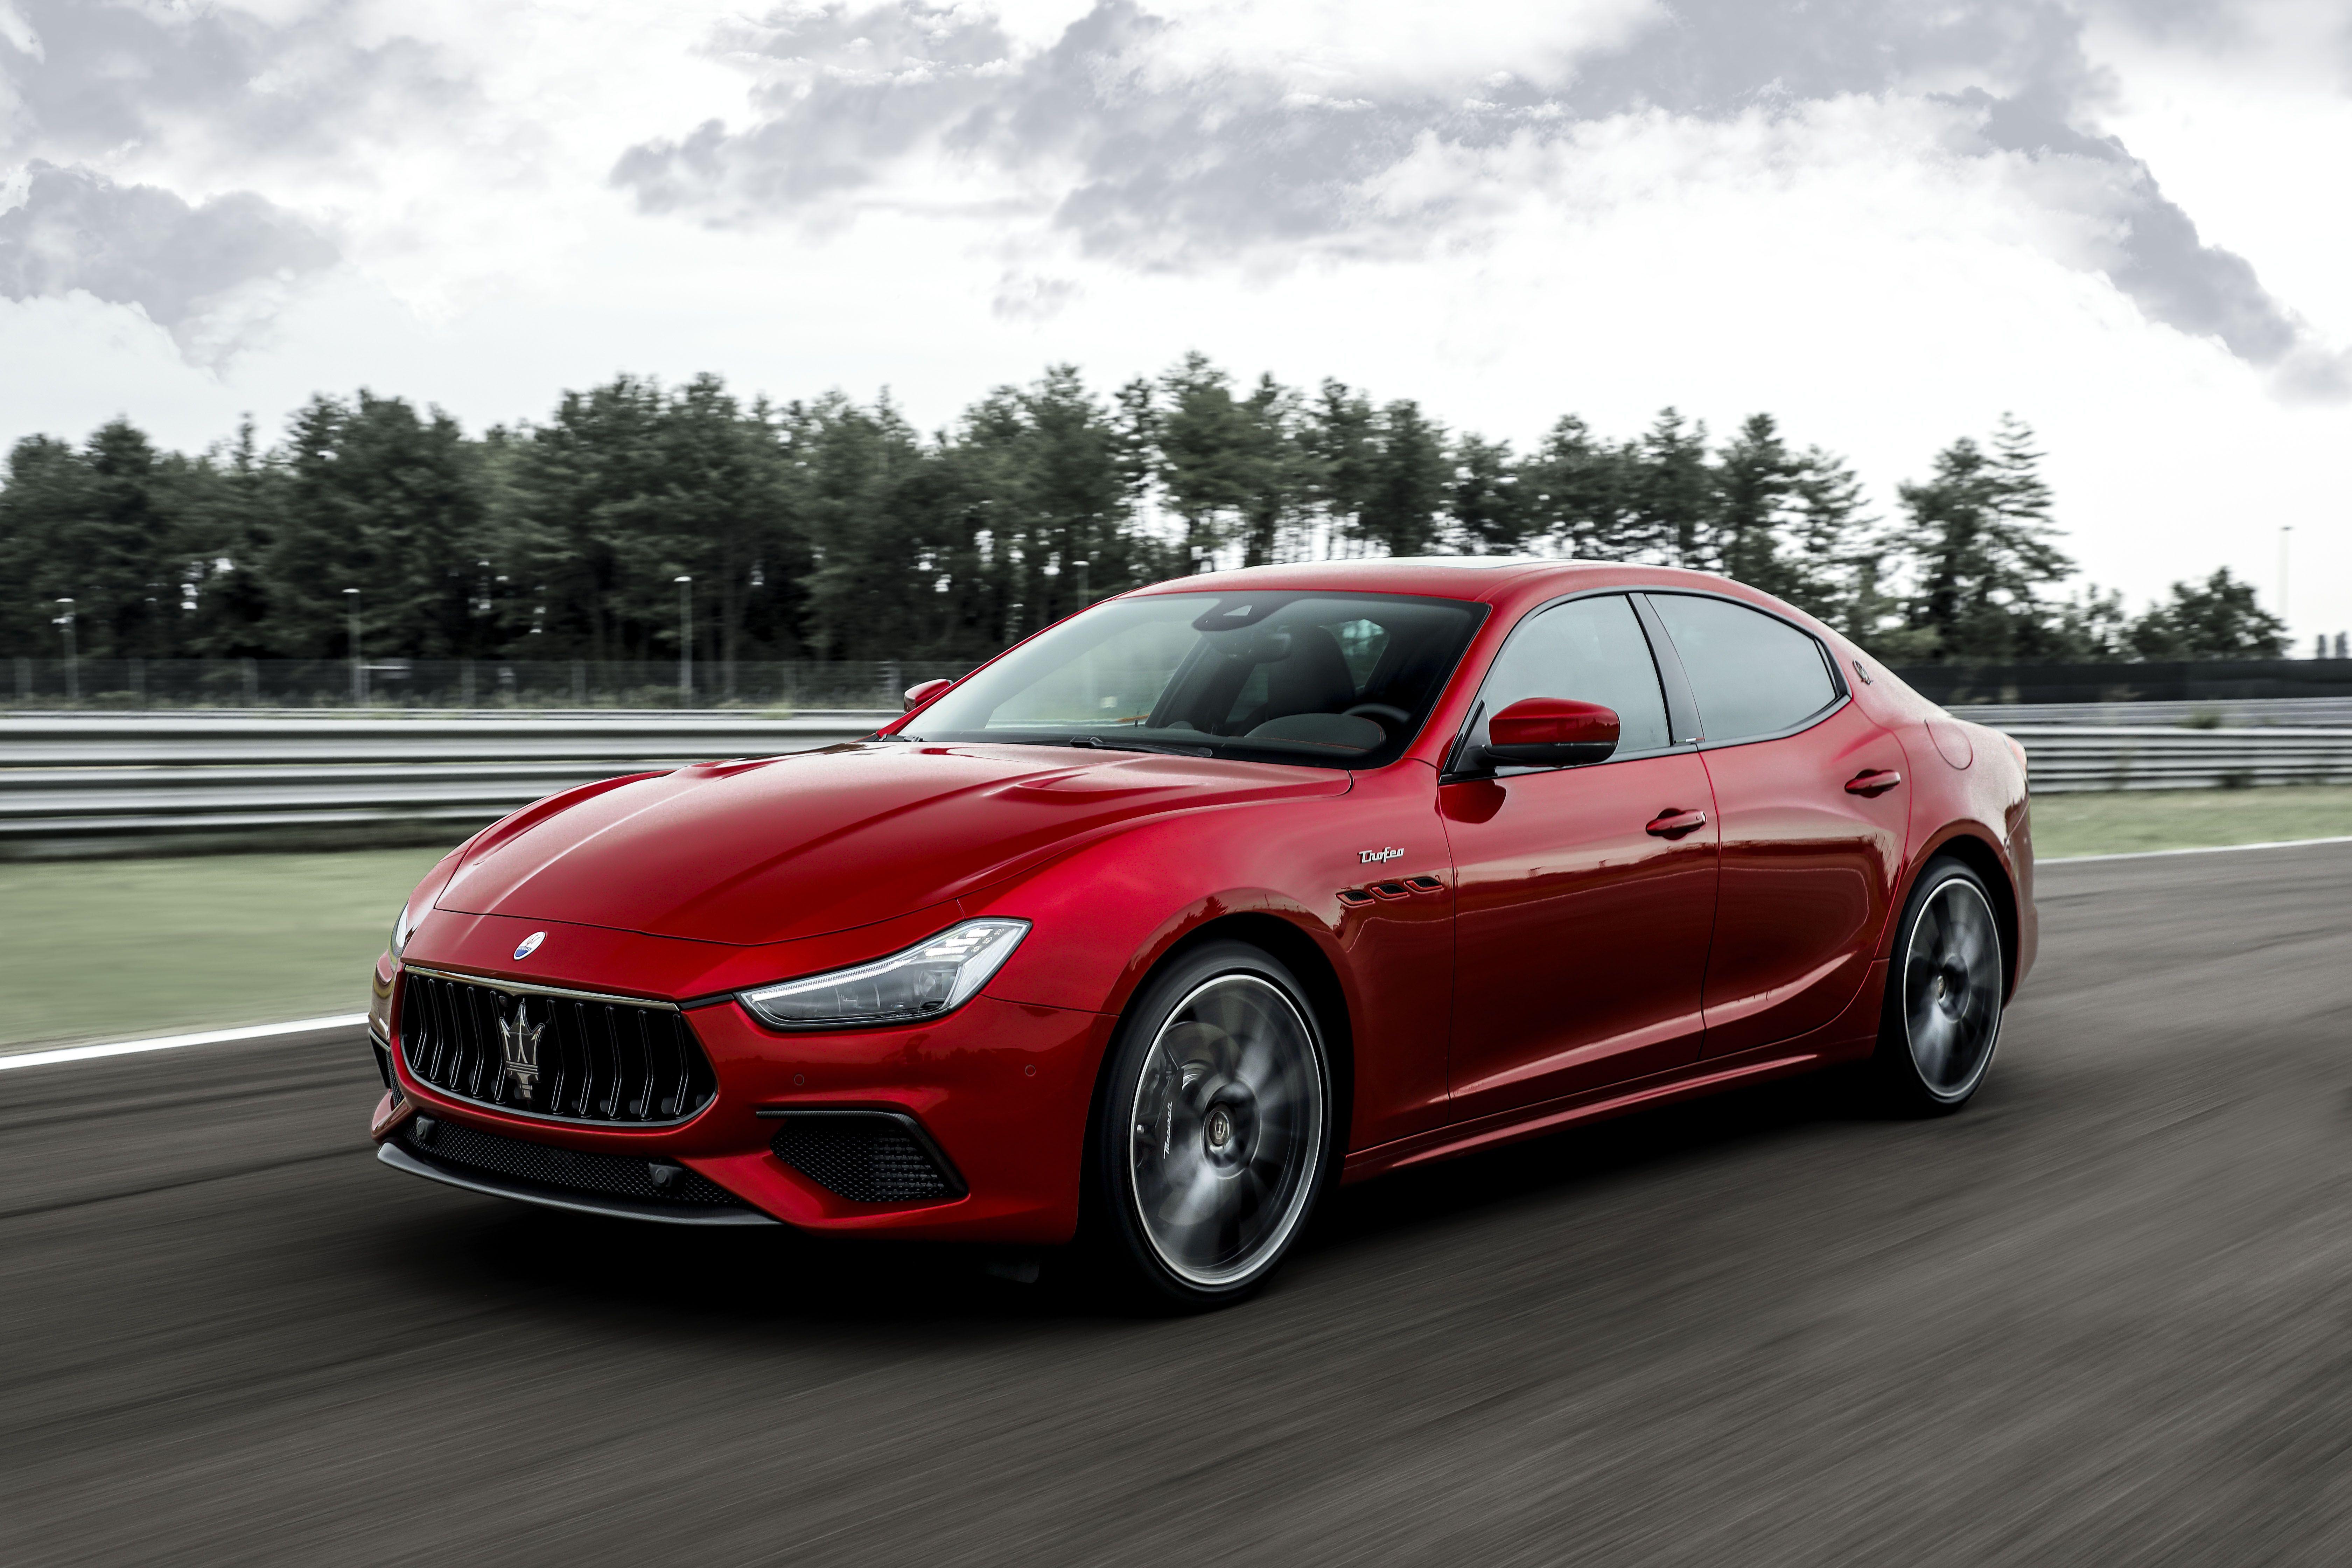 The Maserati Ghibli and Quattroporte Finally Get the 580-HP Ferrari V-8 They Deserve